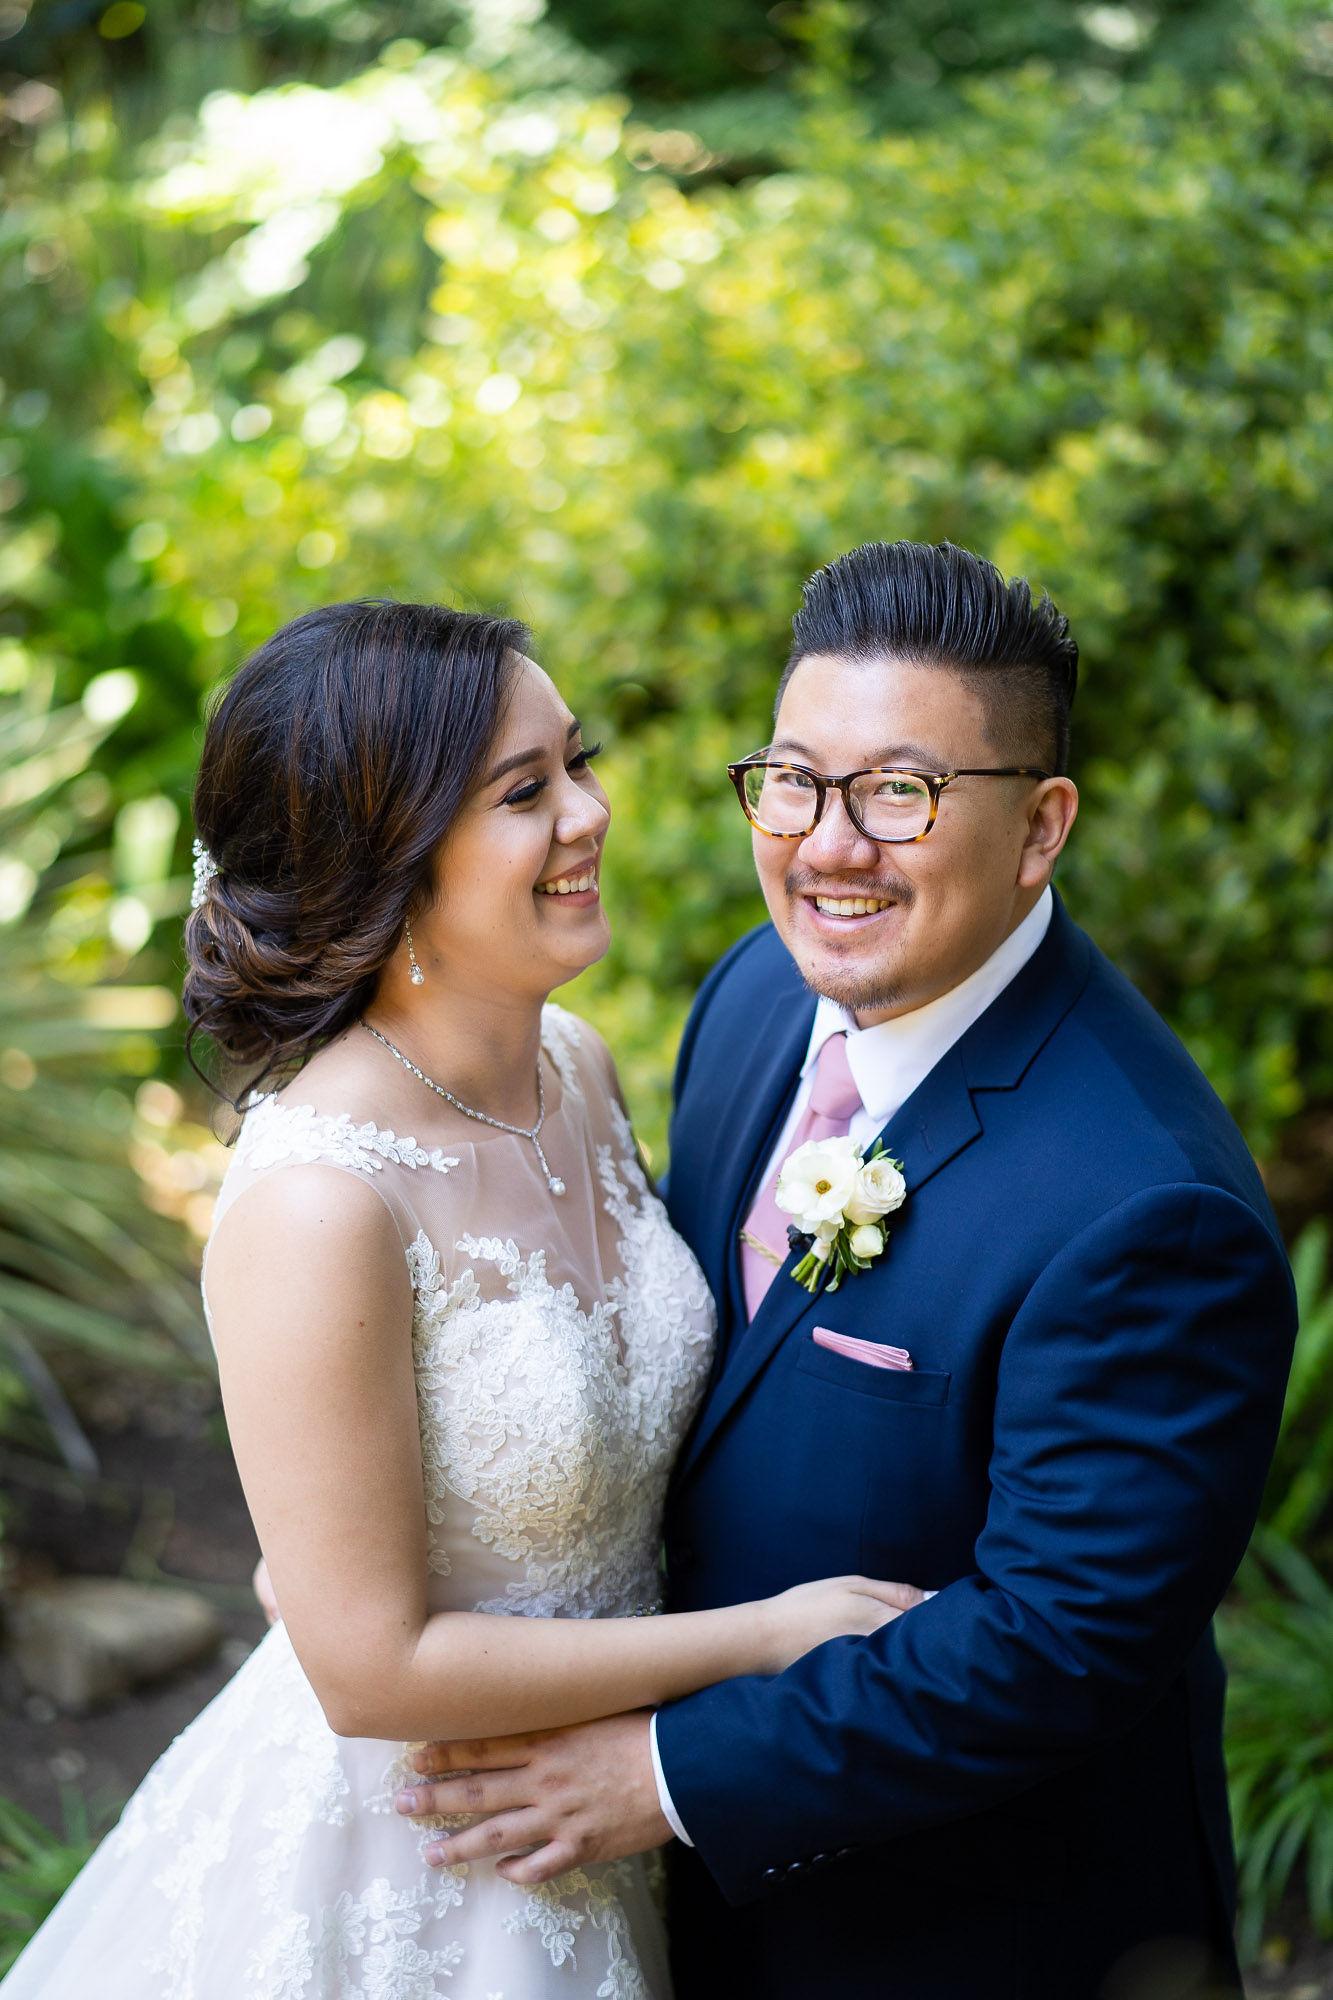 Resized-S&S-WeddingHighlights-11.jpg